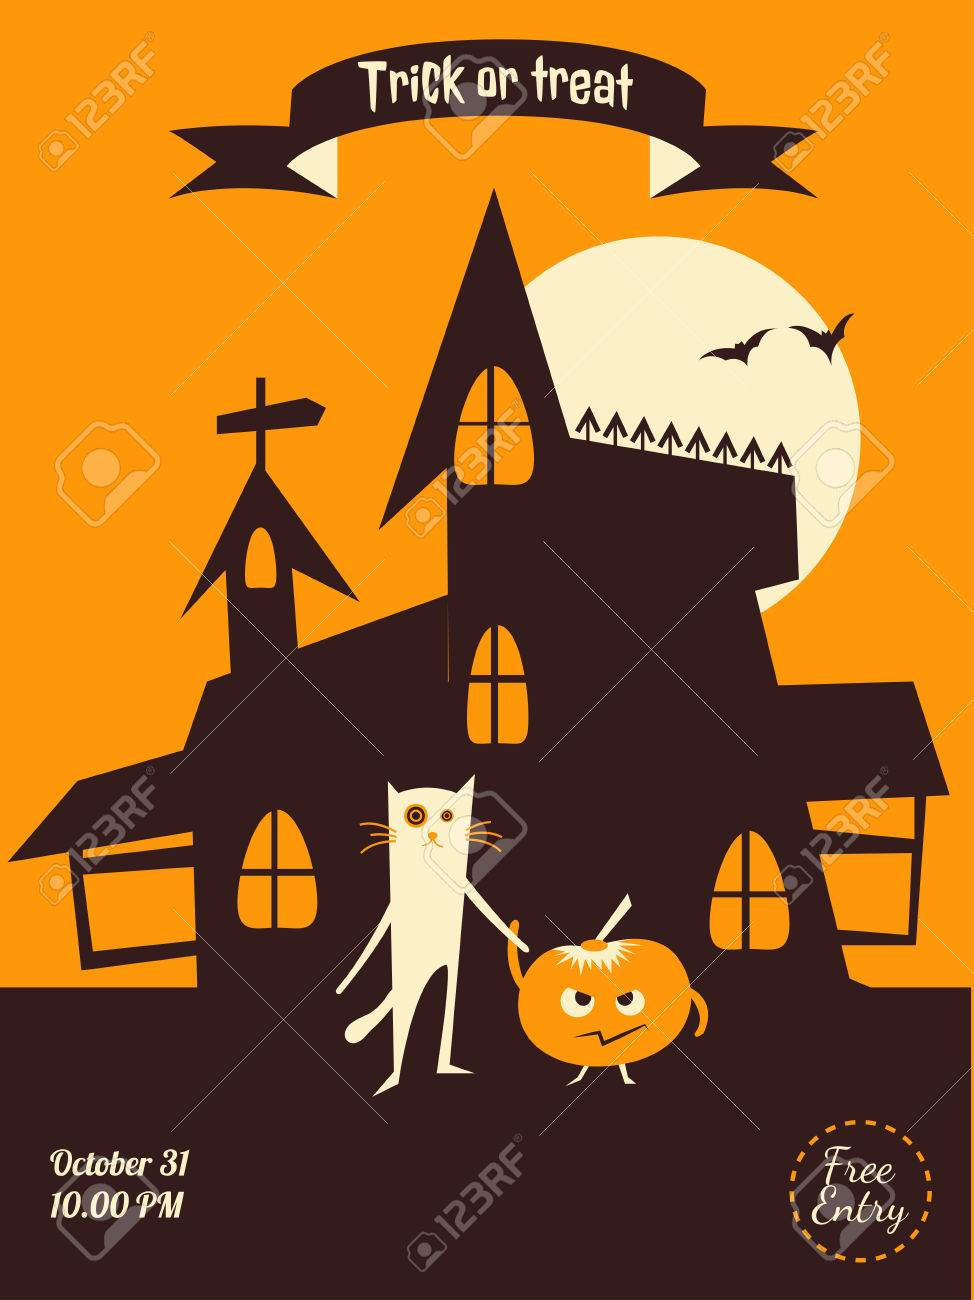 Dracula Castle Cat And Pumplin Illustration For Party Invitation